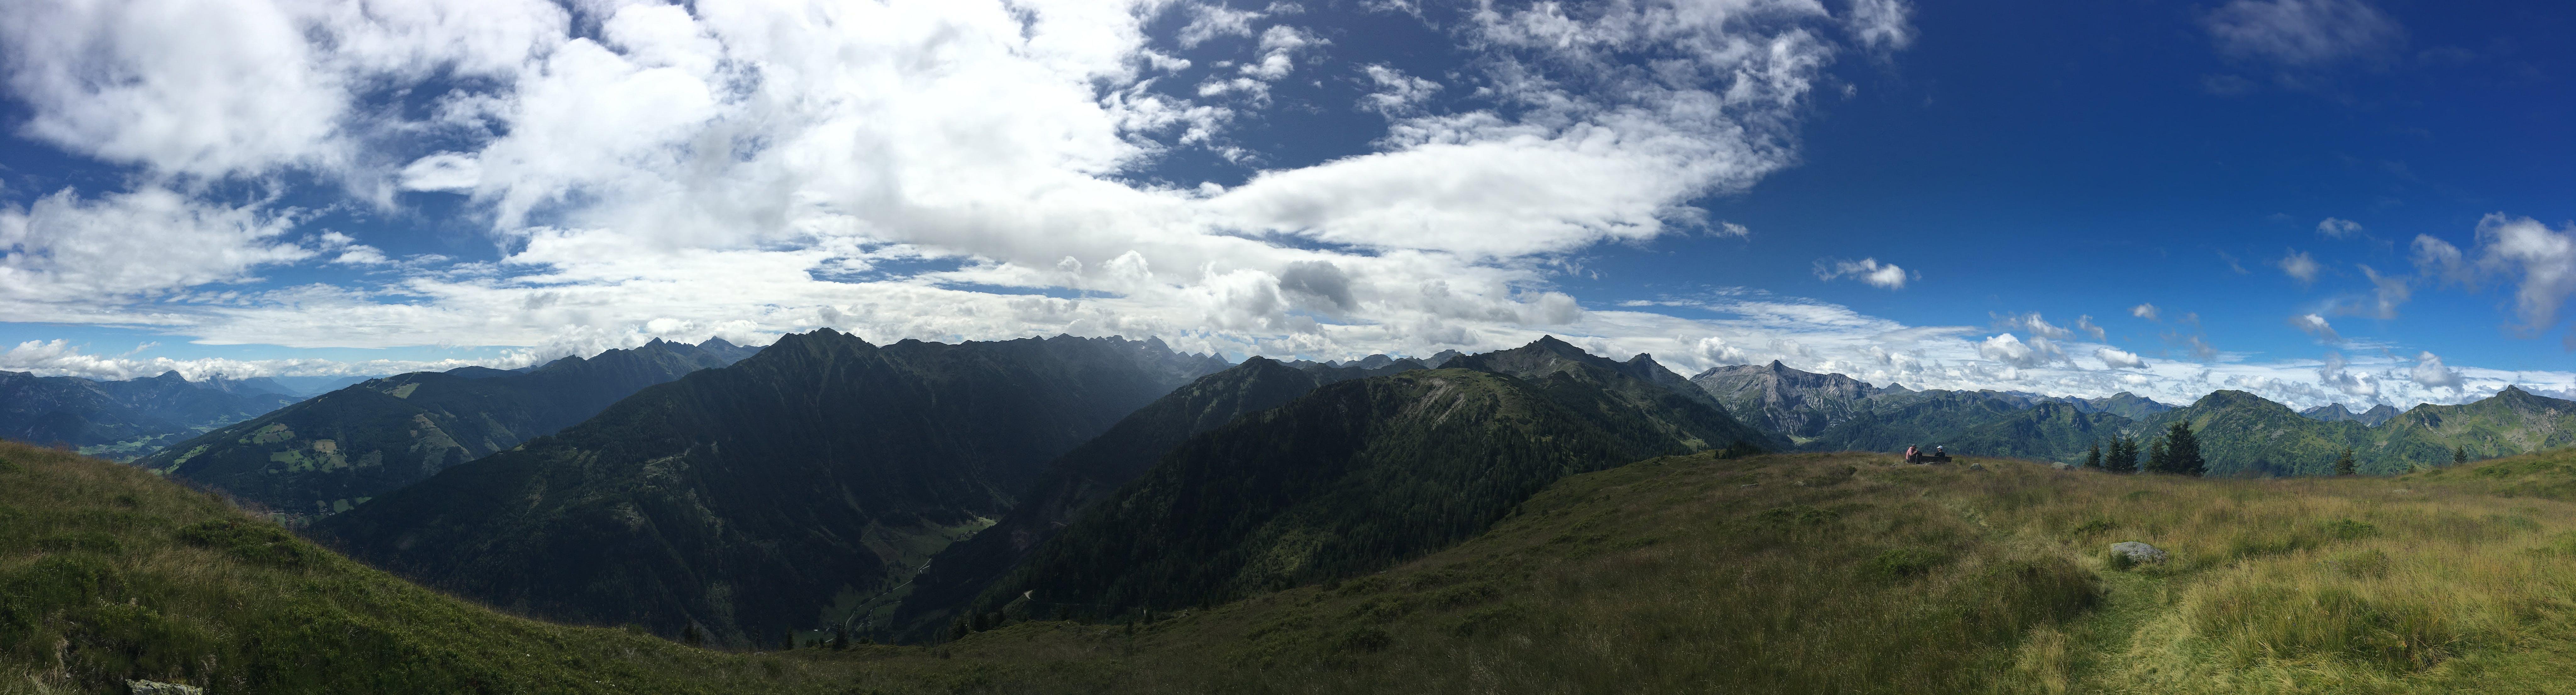 Free stock photo of mountain, hiking, wanderlust, Wandern